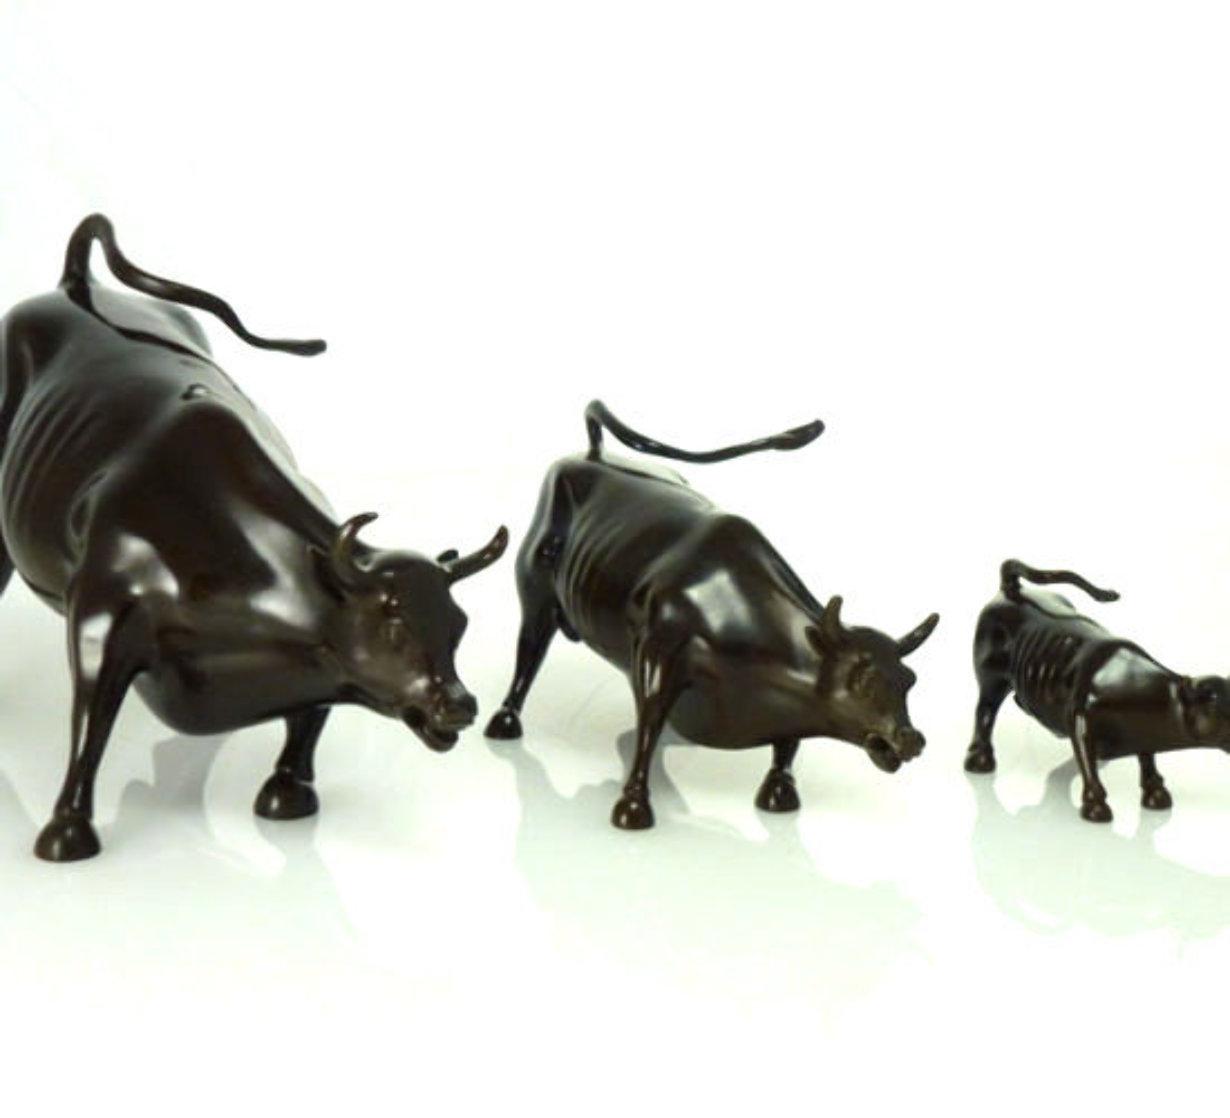 Wall Street Bulls Bronze Sculptures (Set of 3) Sculpture by Arturo Di Modica